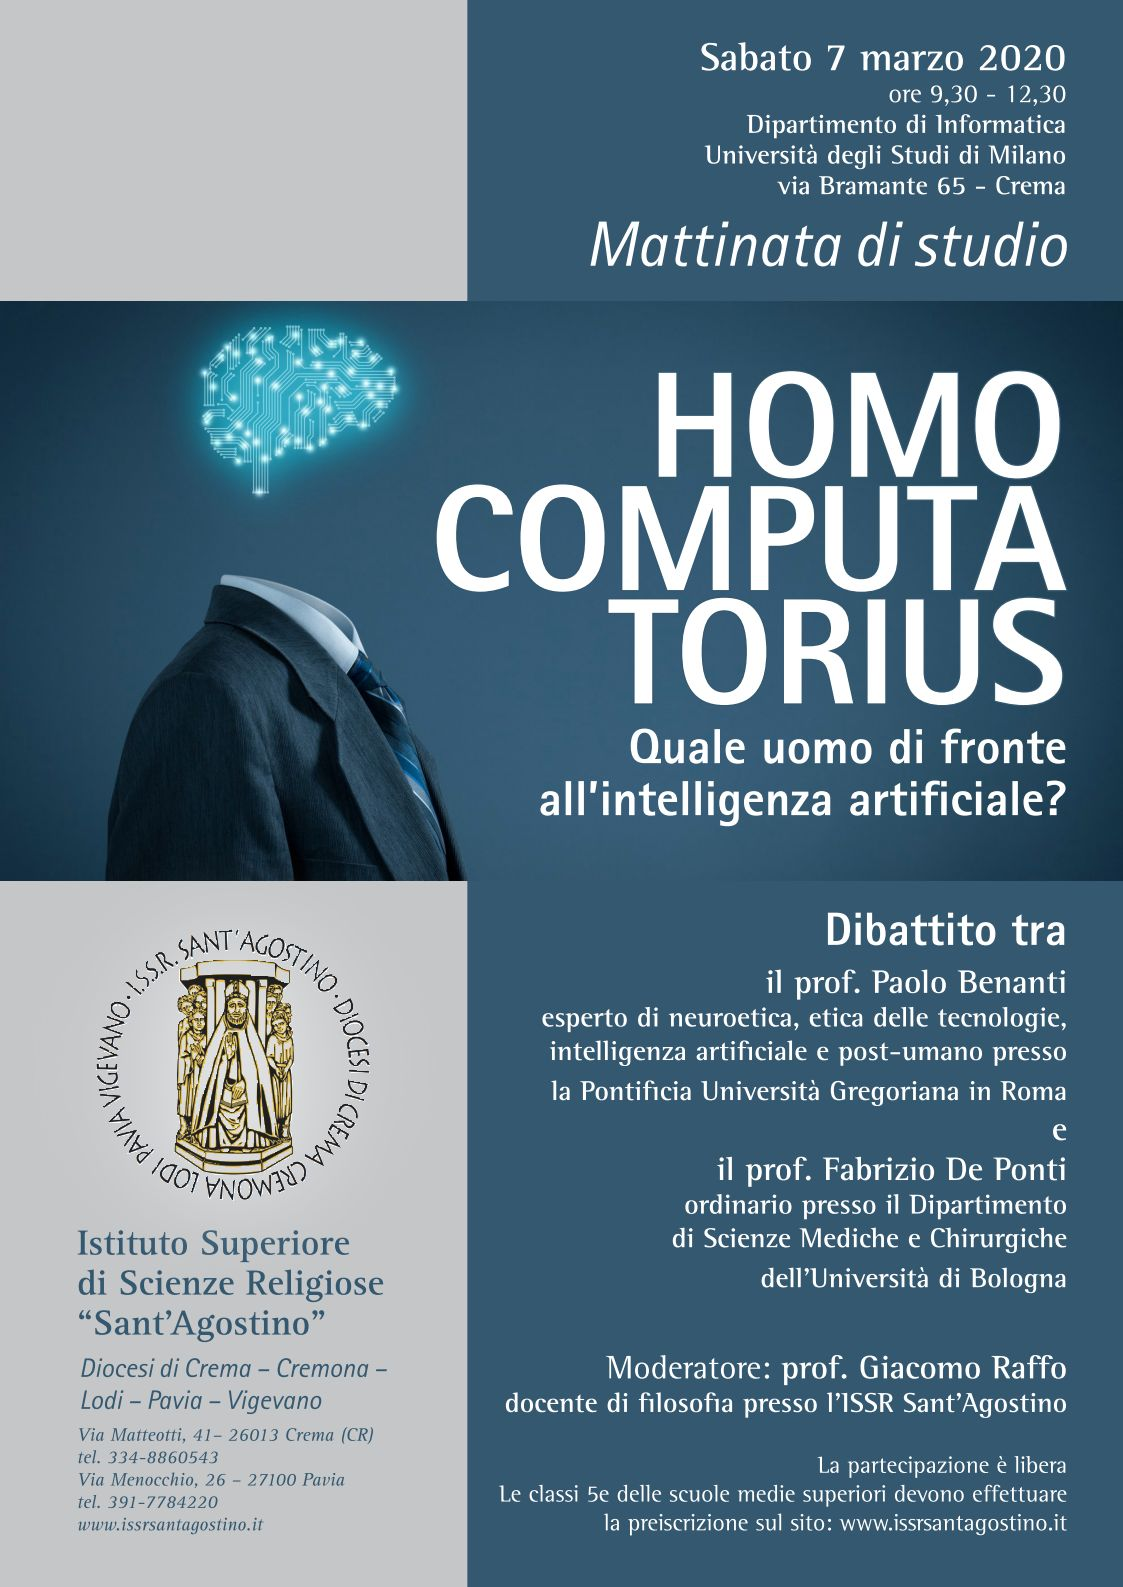 Homo-computatorius